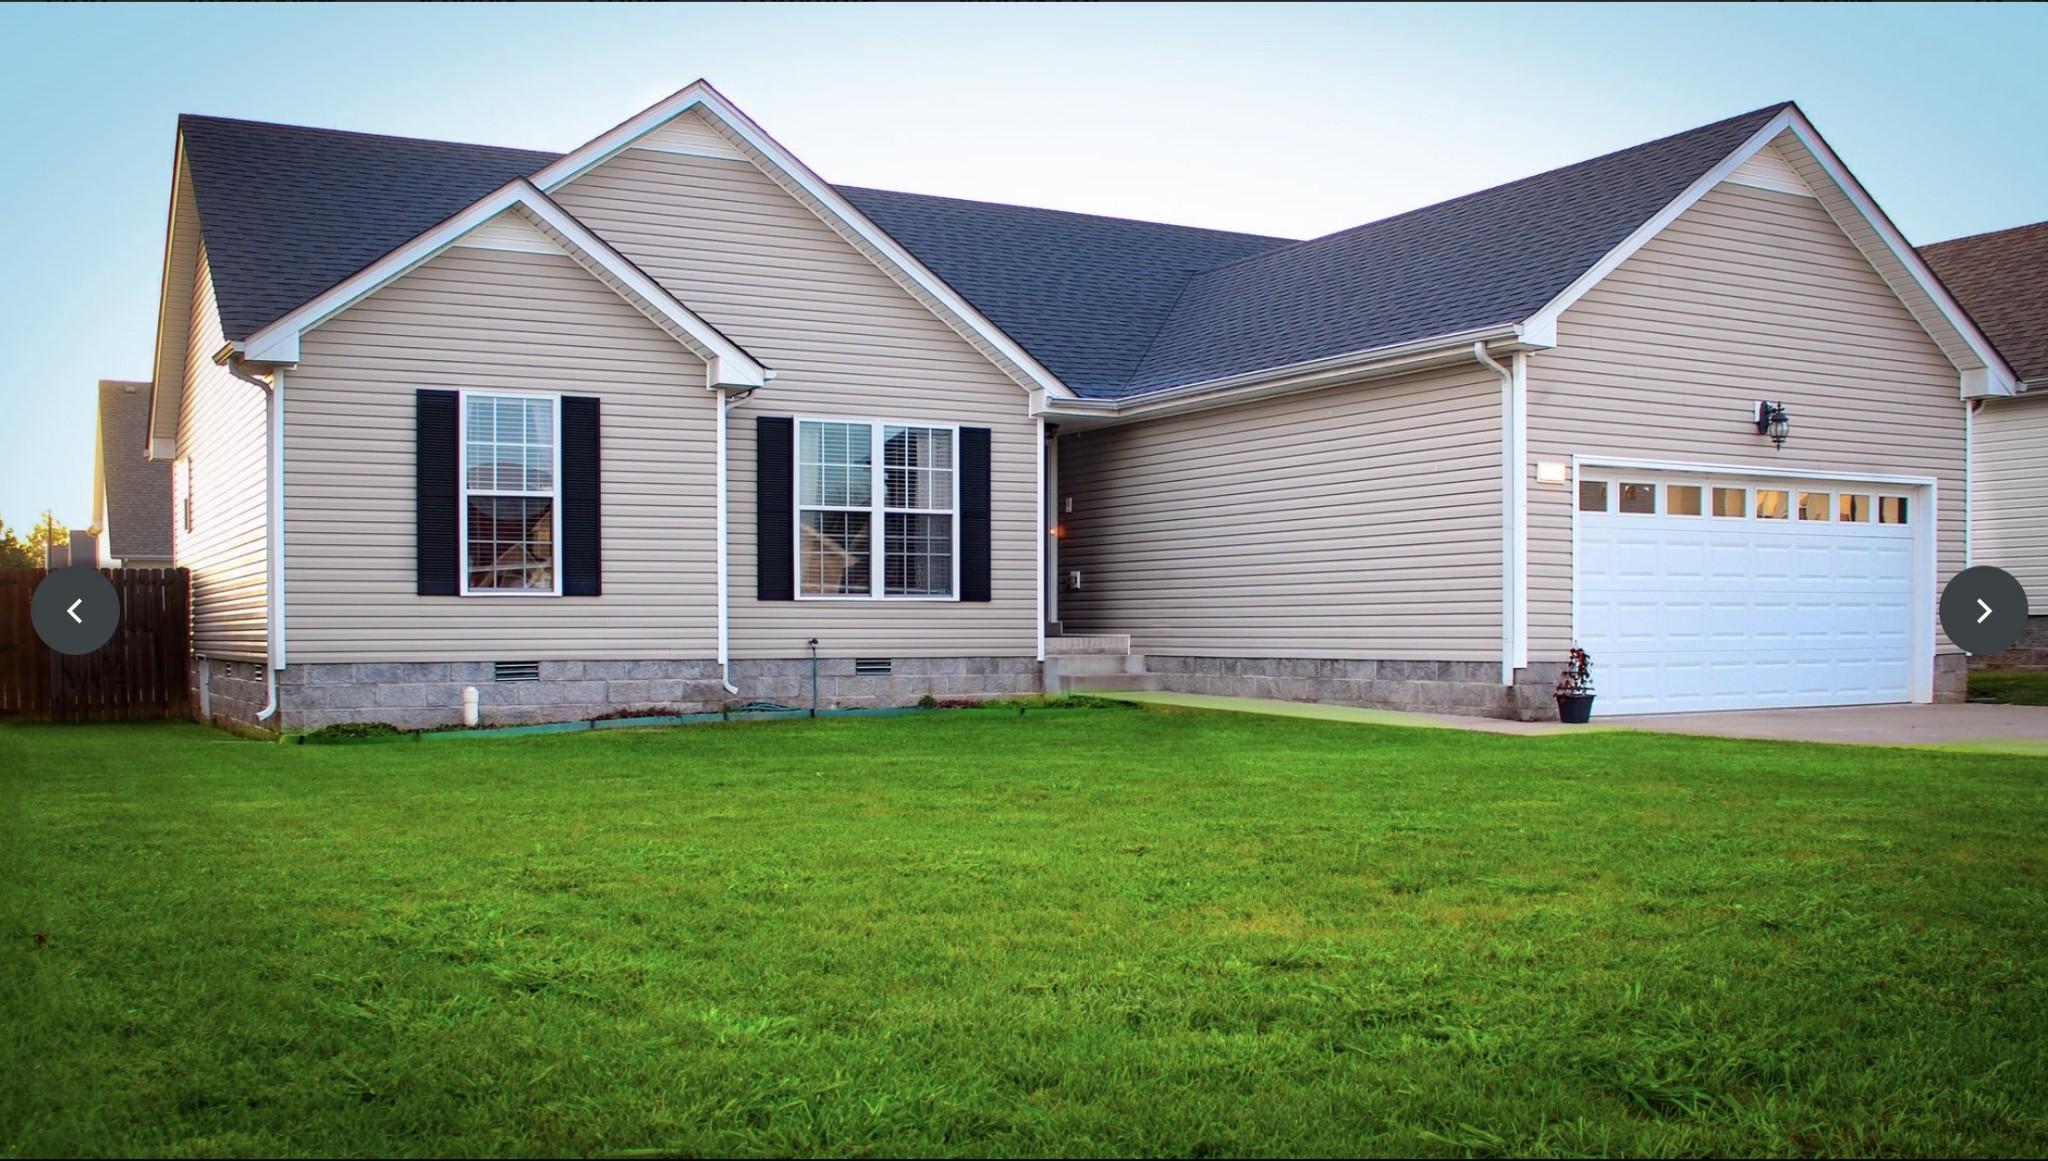 3704 S Jot Dr Property Photo